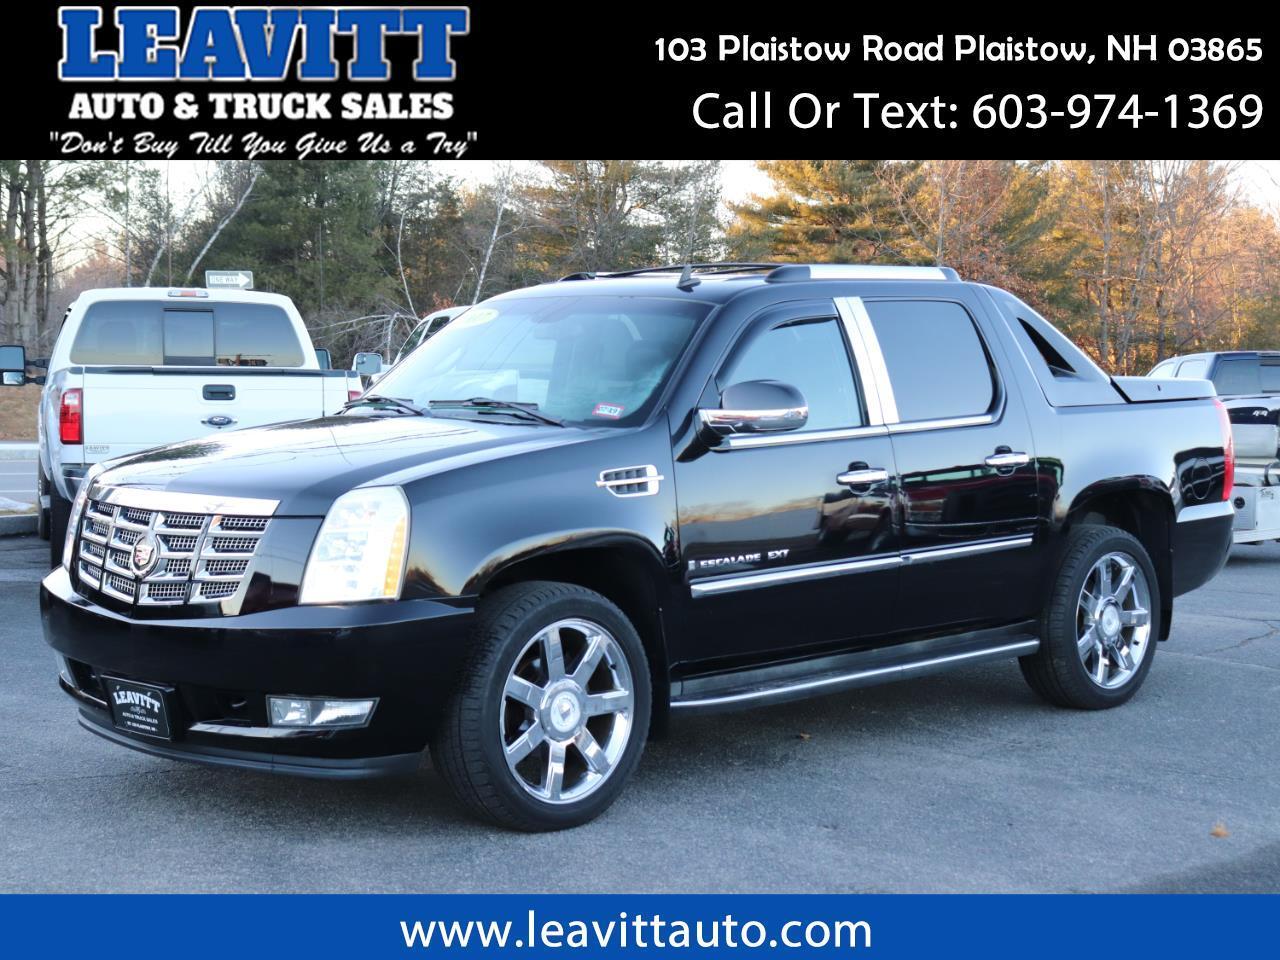 2007 Cadillac Escalade EXT BLACK ON BLACK LOADED